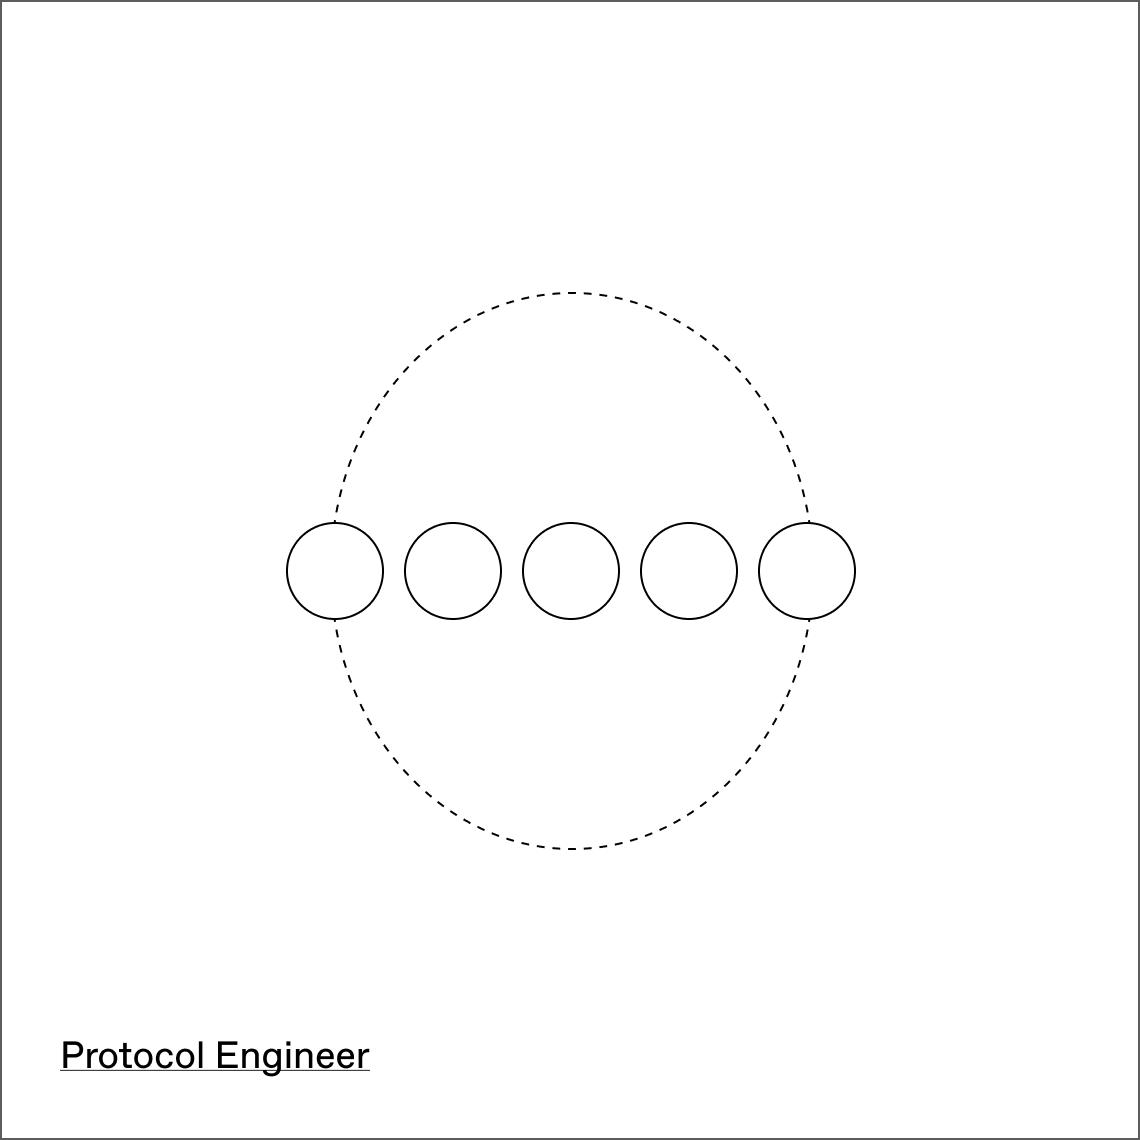 protocol engineer